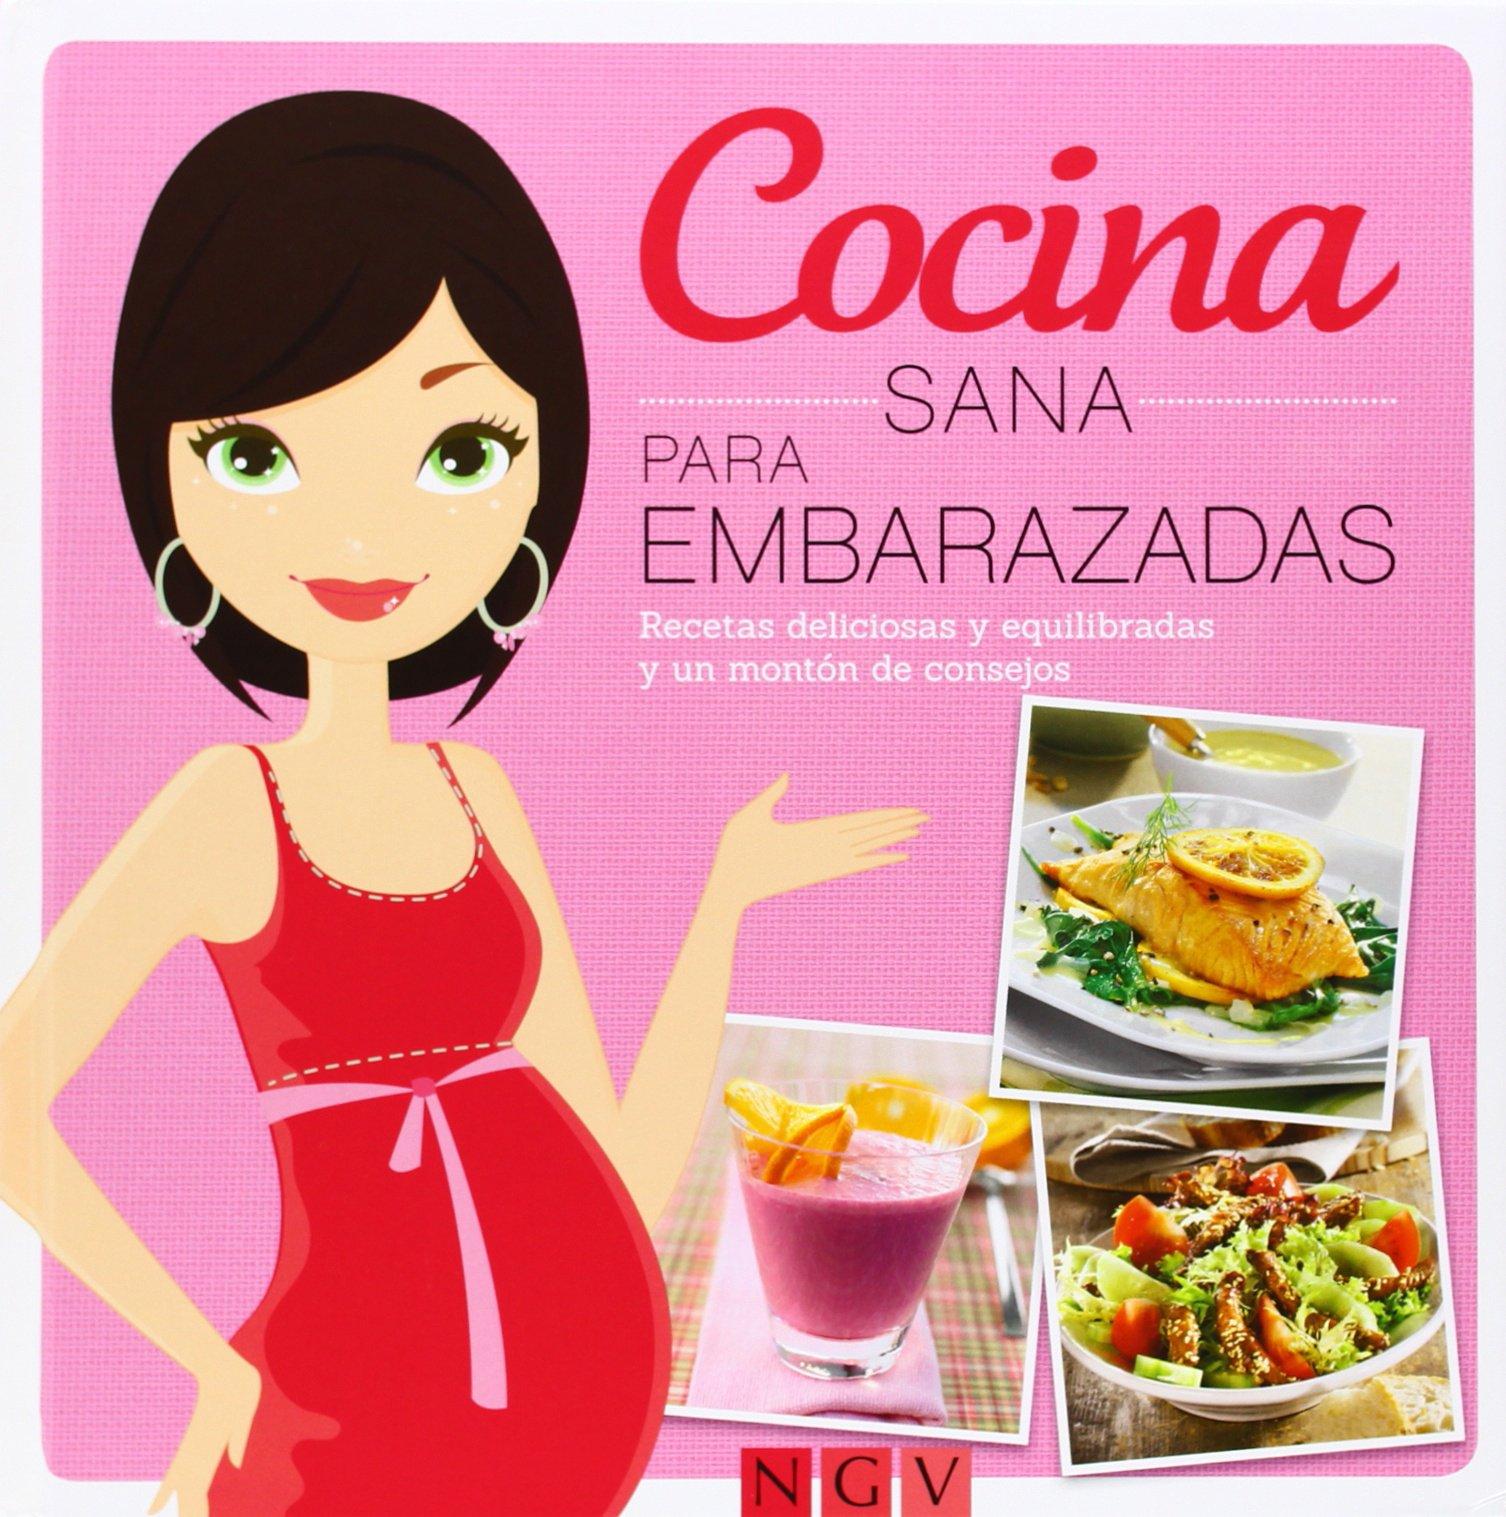 Cocina Sana Para Embarazadas: Amazon.es: Vv.Aa.: Libros